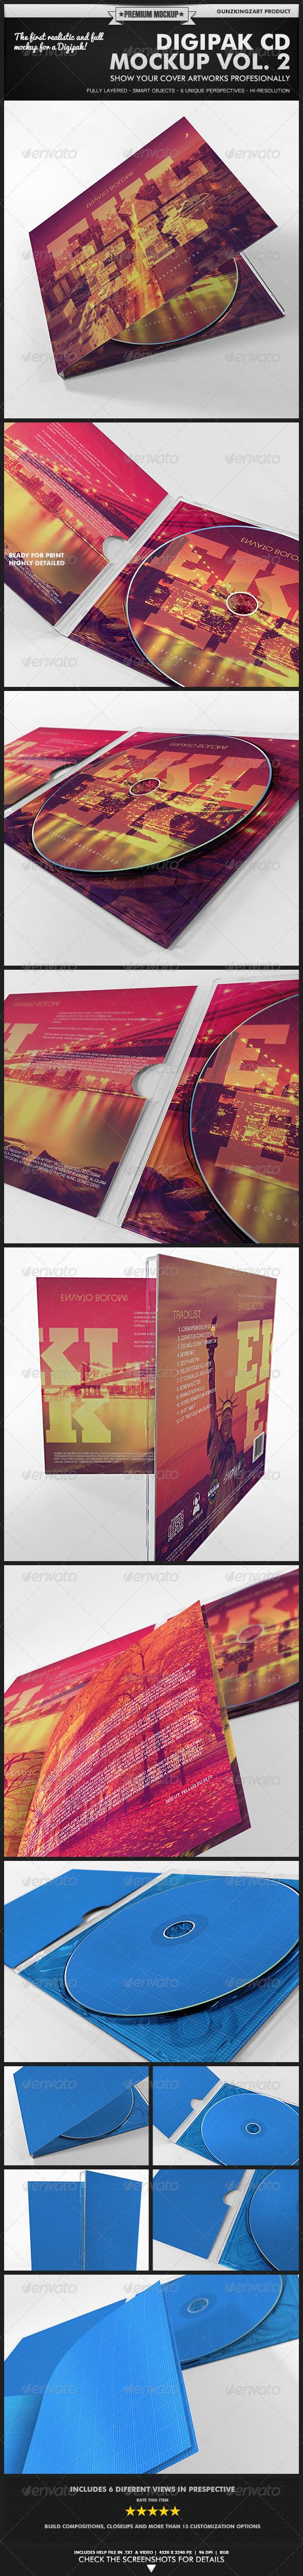 GraphicRiver Digipak CD Mockup Vol 2 Kit 3946656